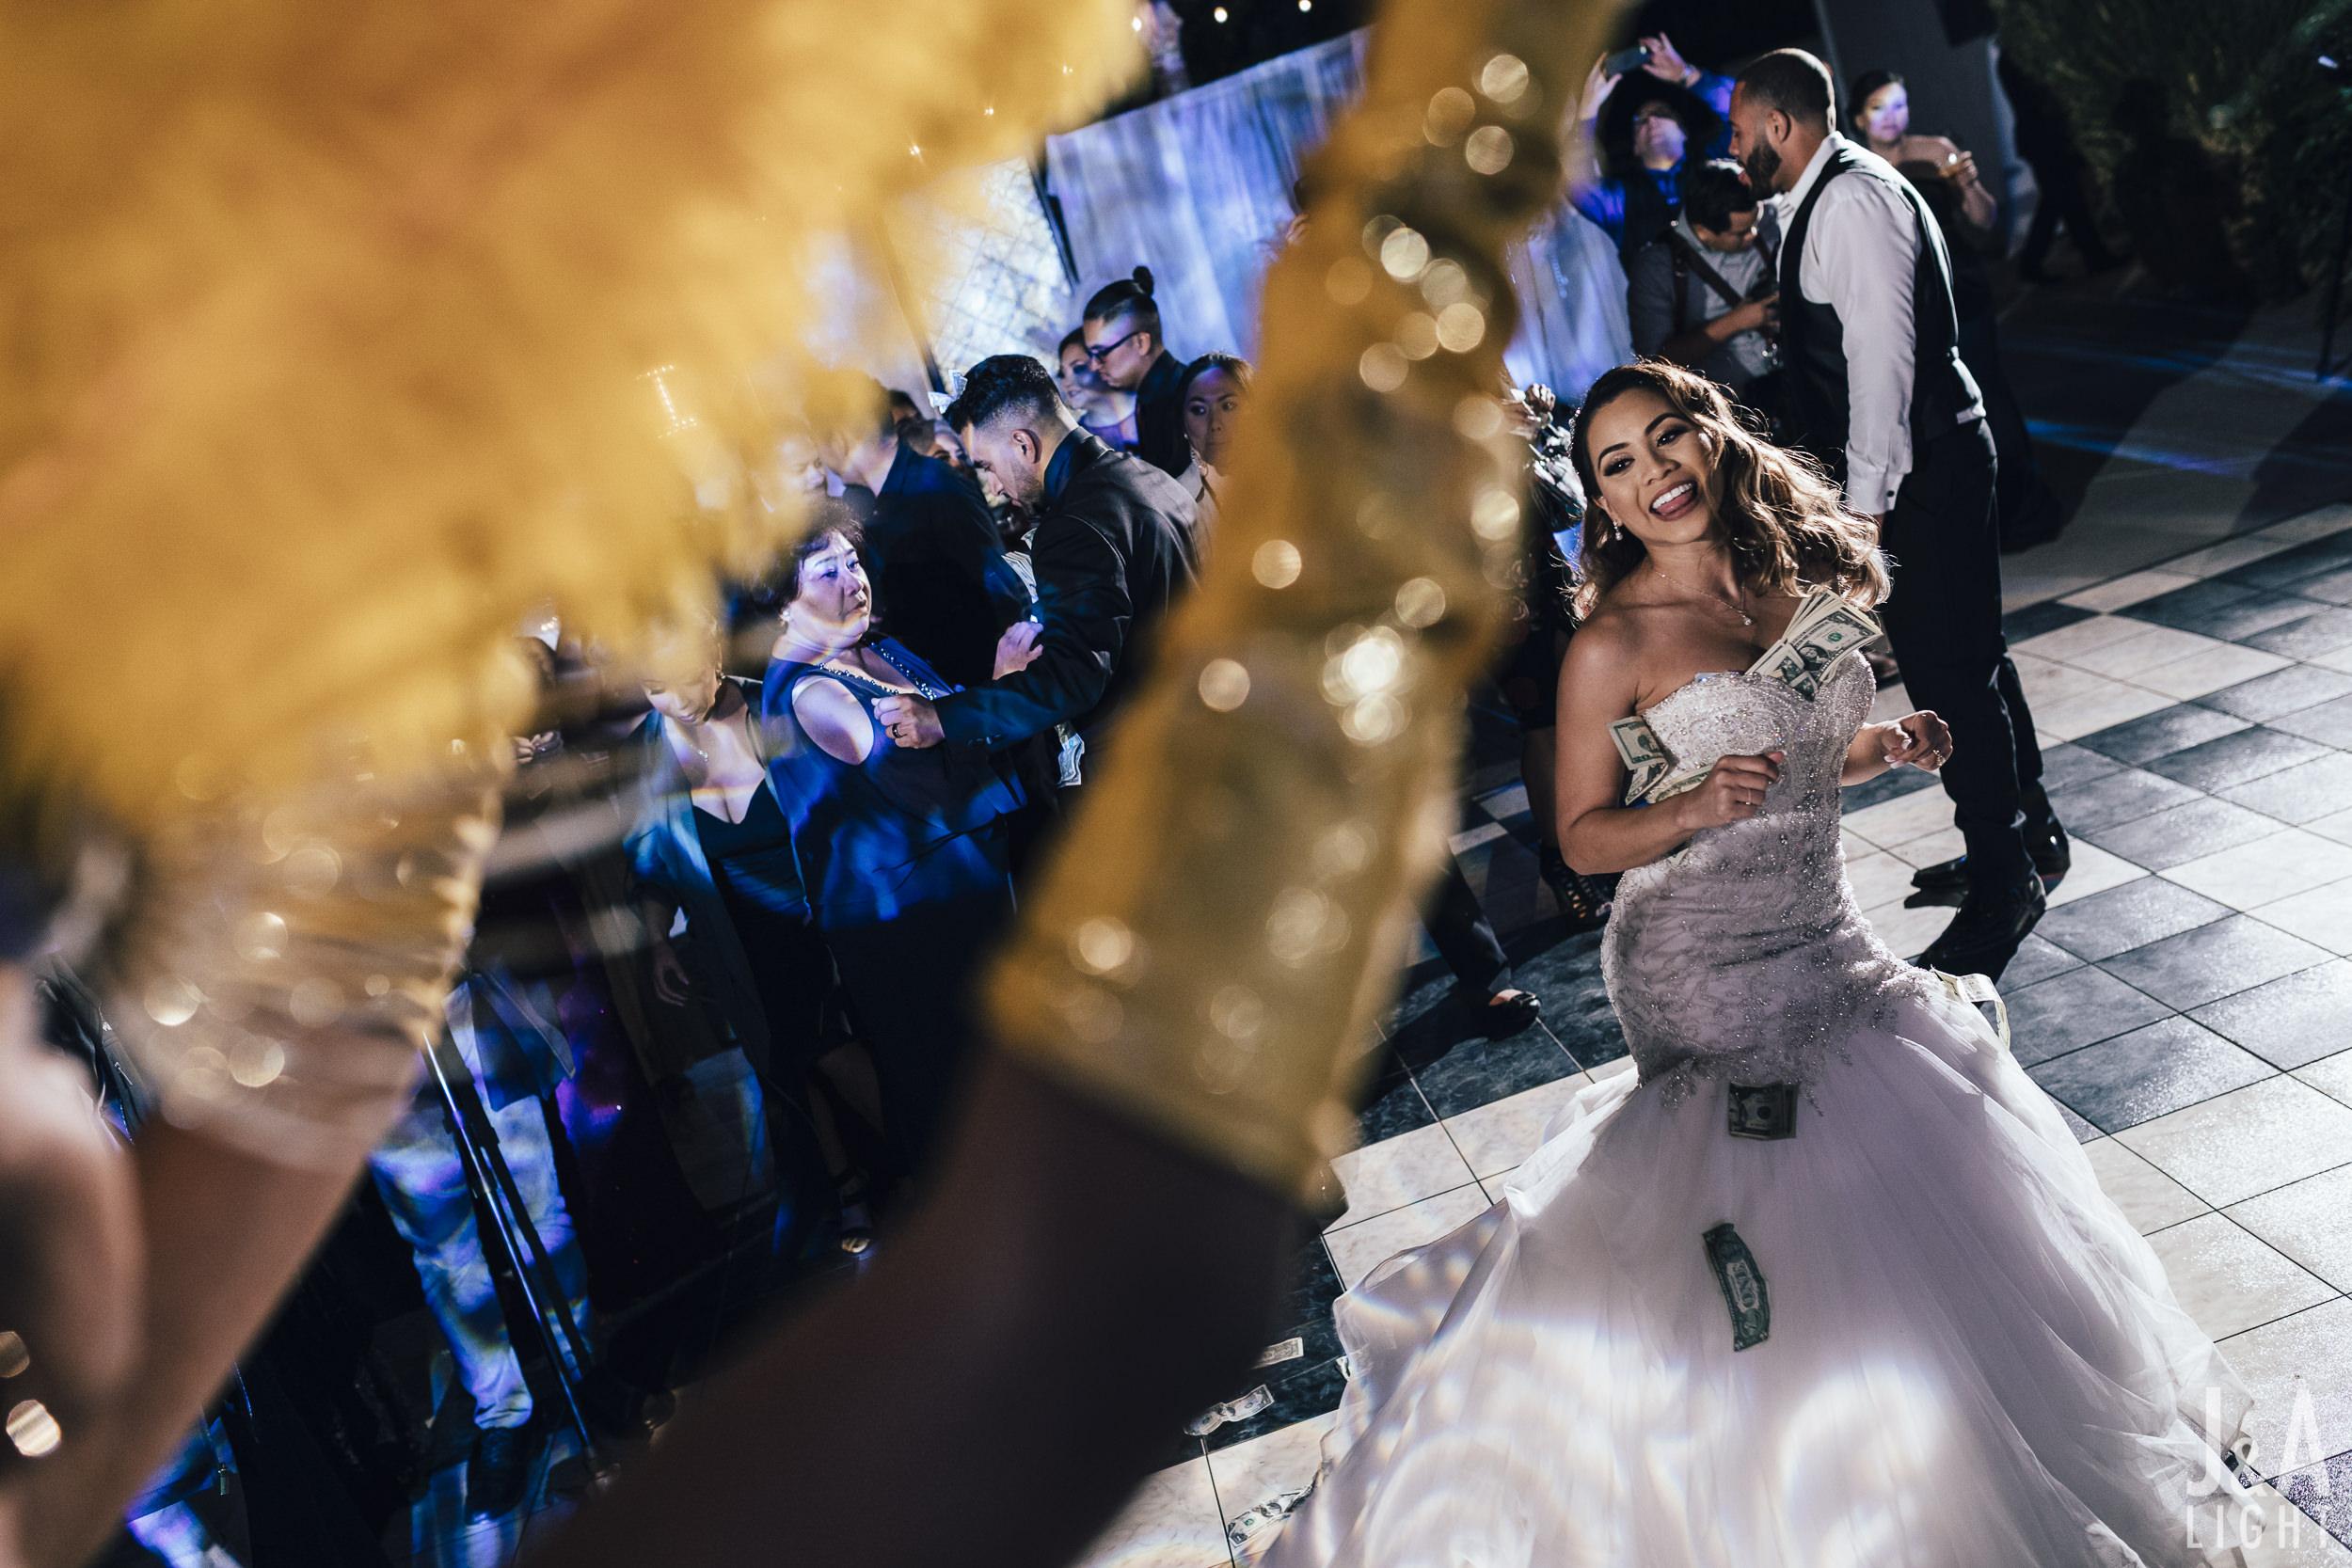 20171014-JanDan-LosBanos-GlassMansion-Wedding-Blog-080.jpg